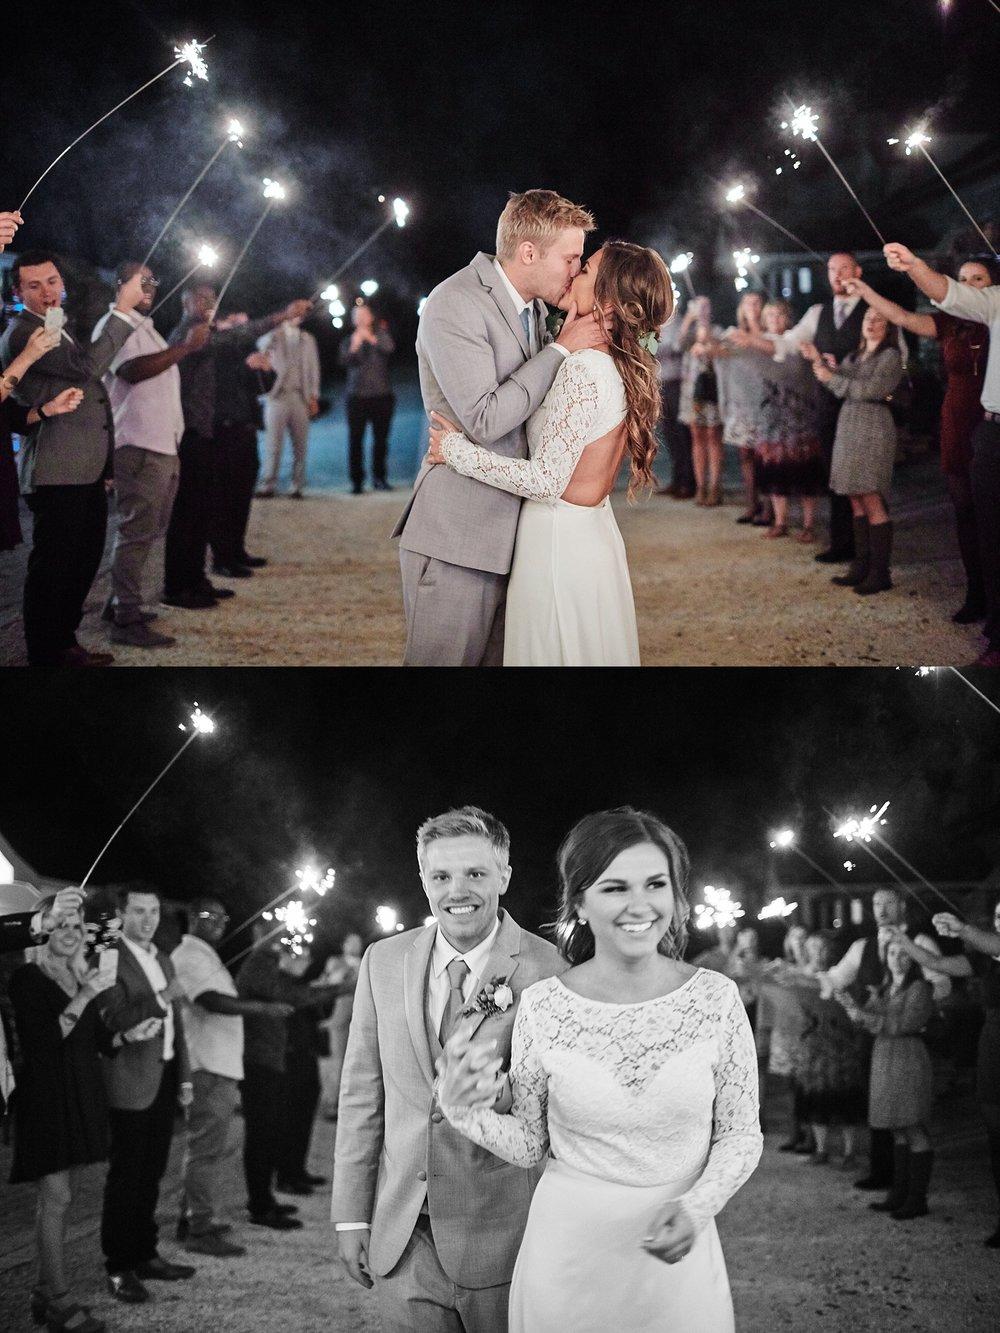 Maywood-Stone-Barn-Wedding-Rochester-Minnesota-Perry-James-Photo_0703.jpg